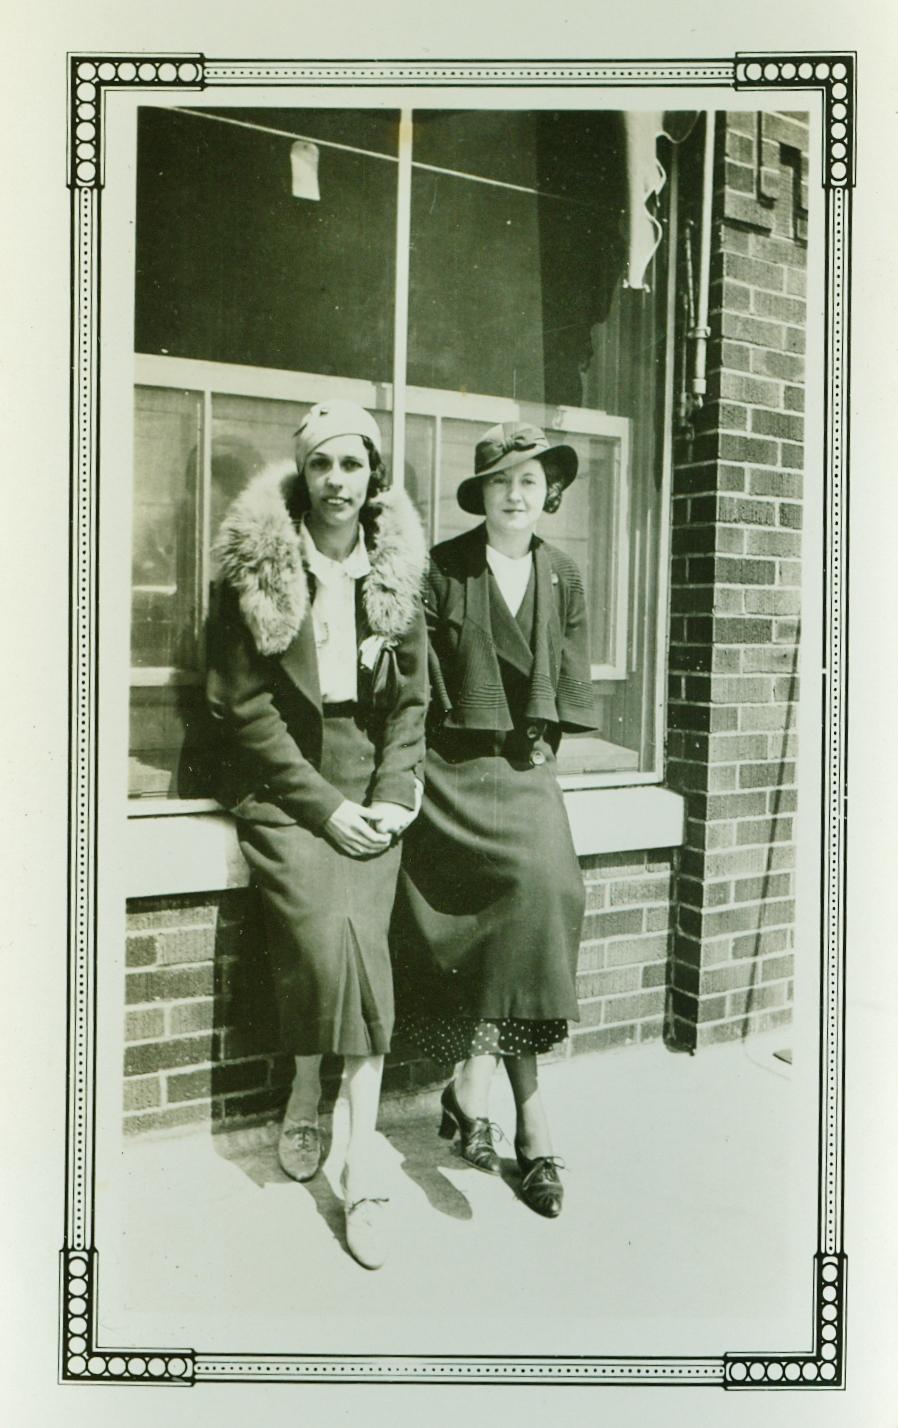 Helen Gaffney Jones Mantle & Maudie Dennis , May 1934